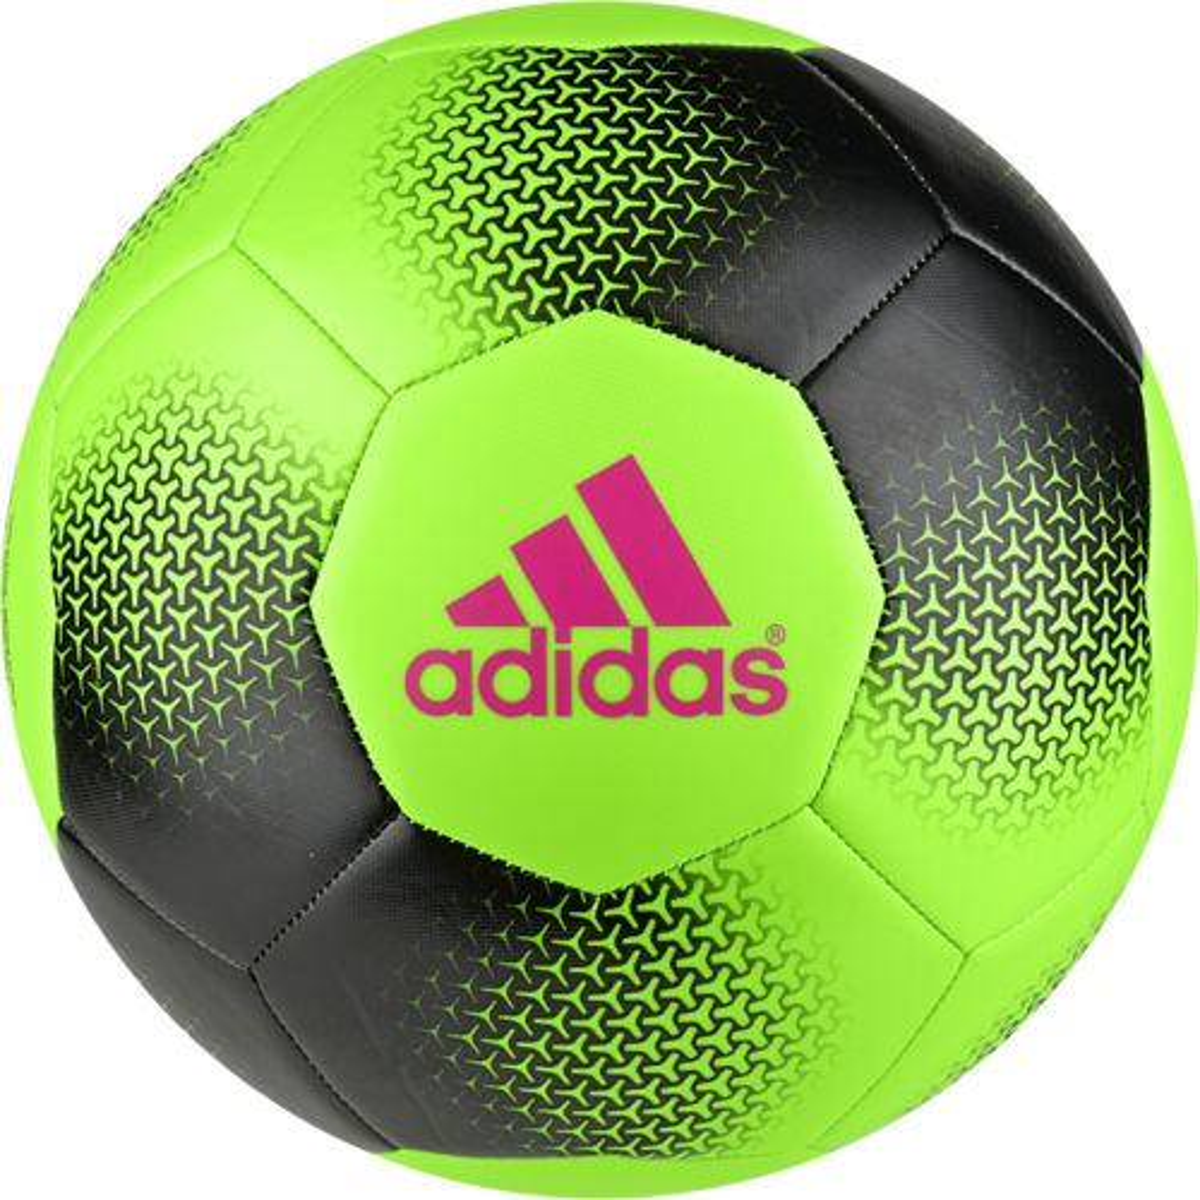 adidas™ Ace Glider Soccer Ball